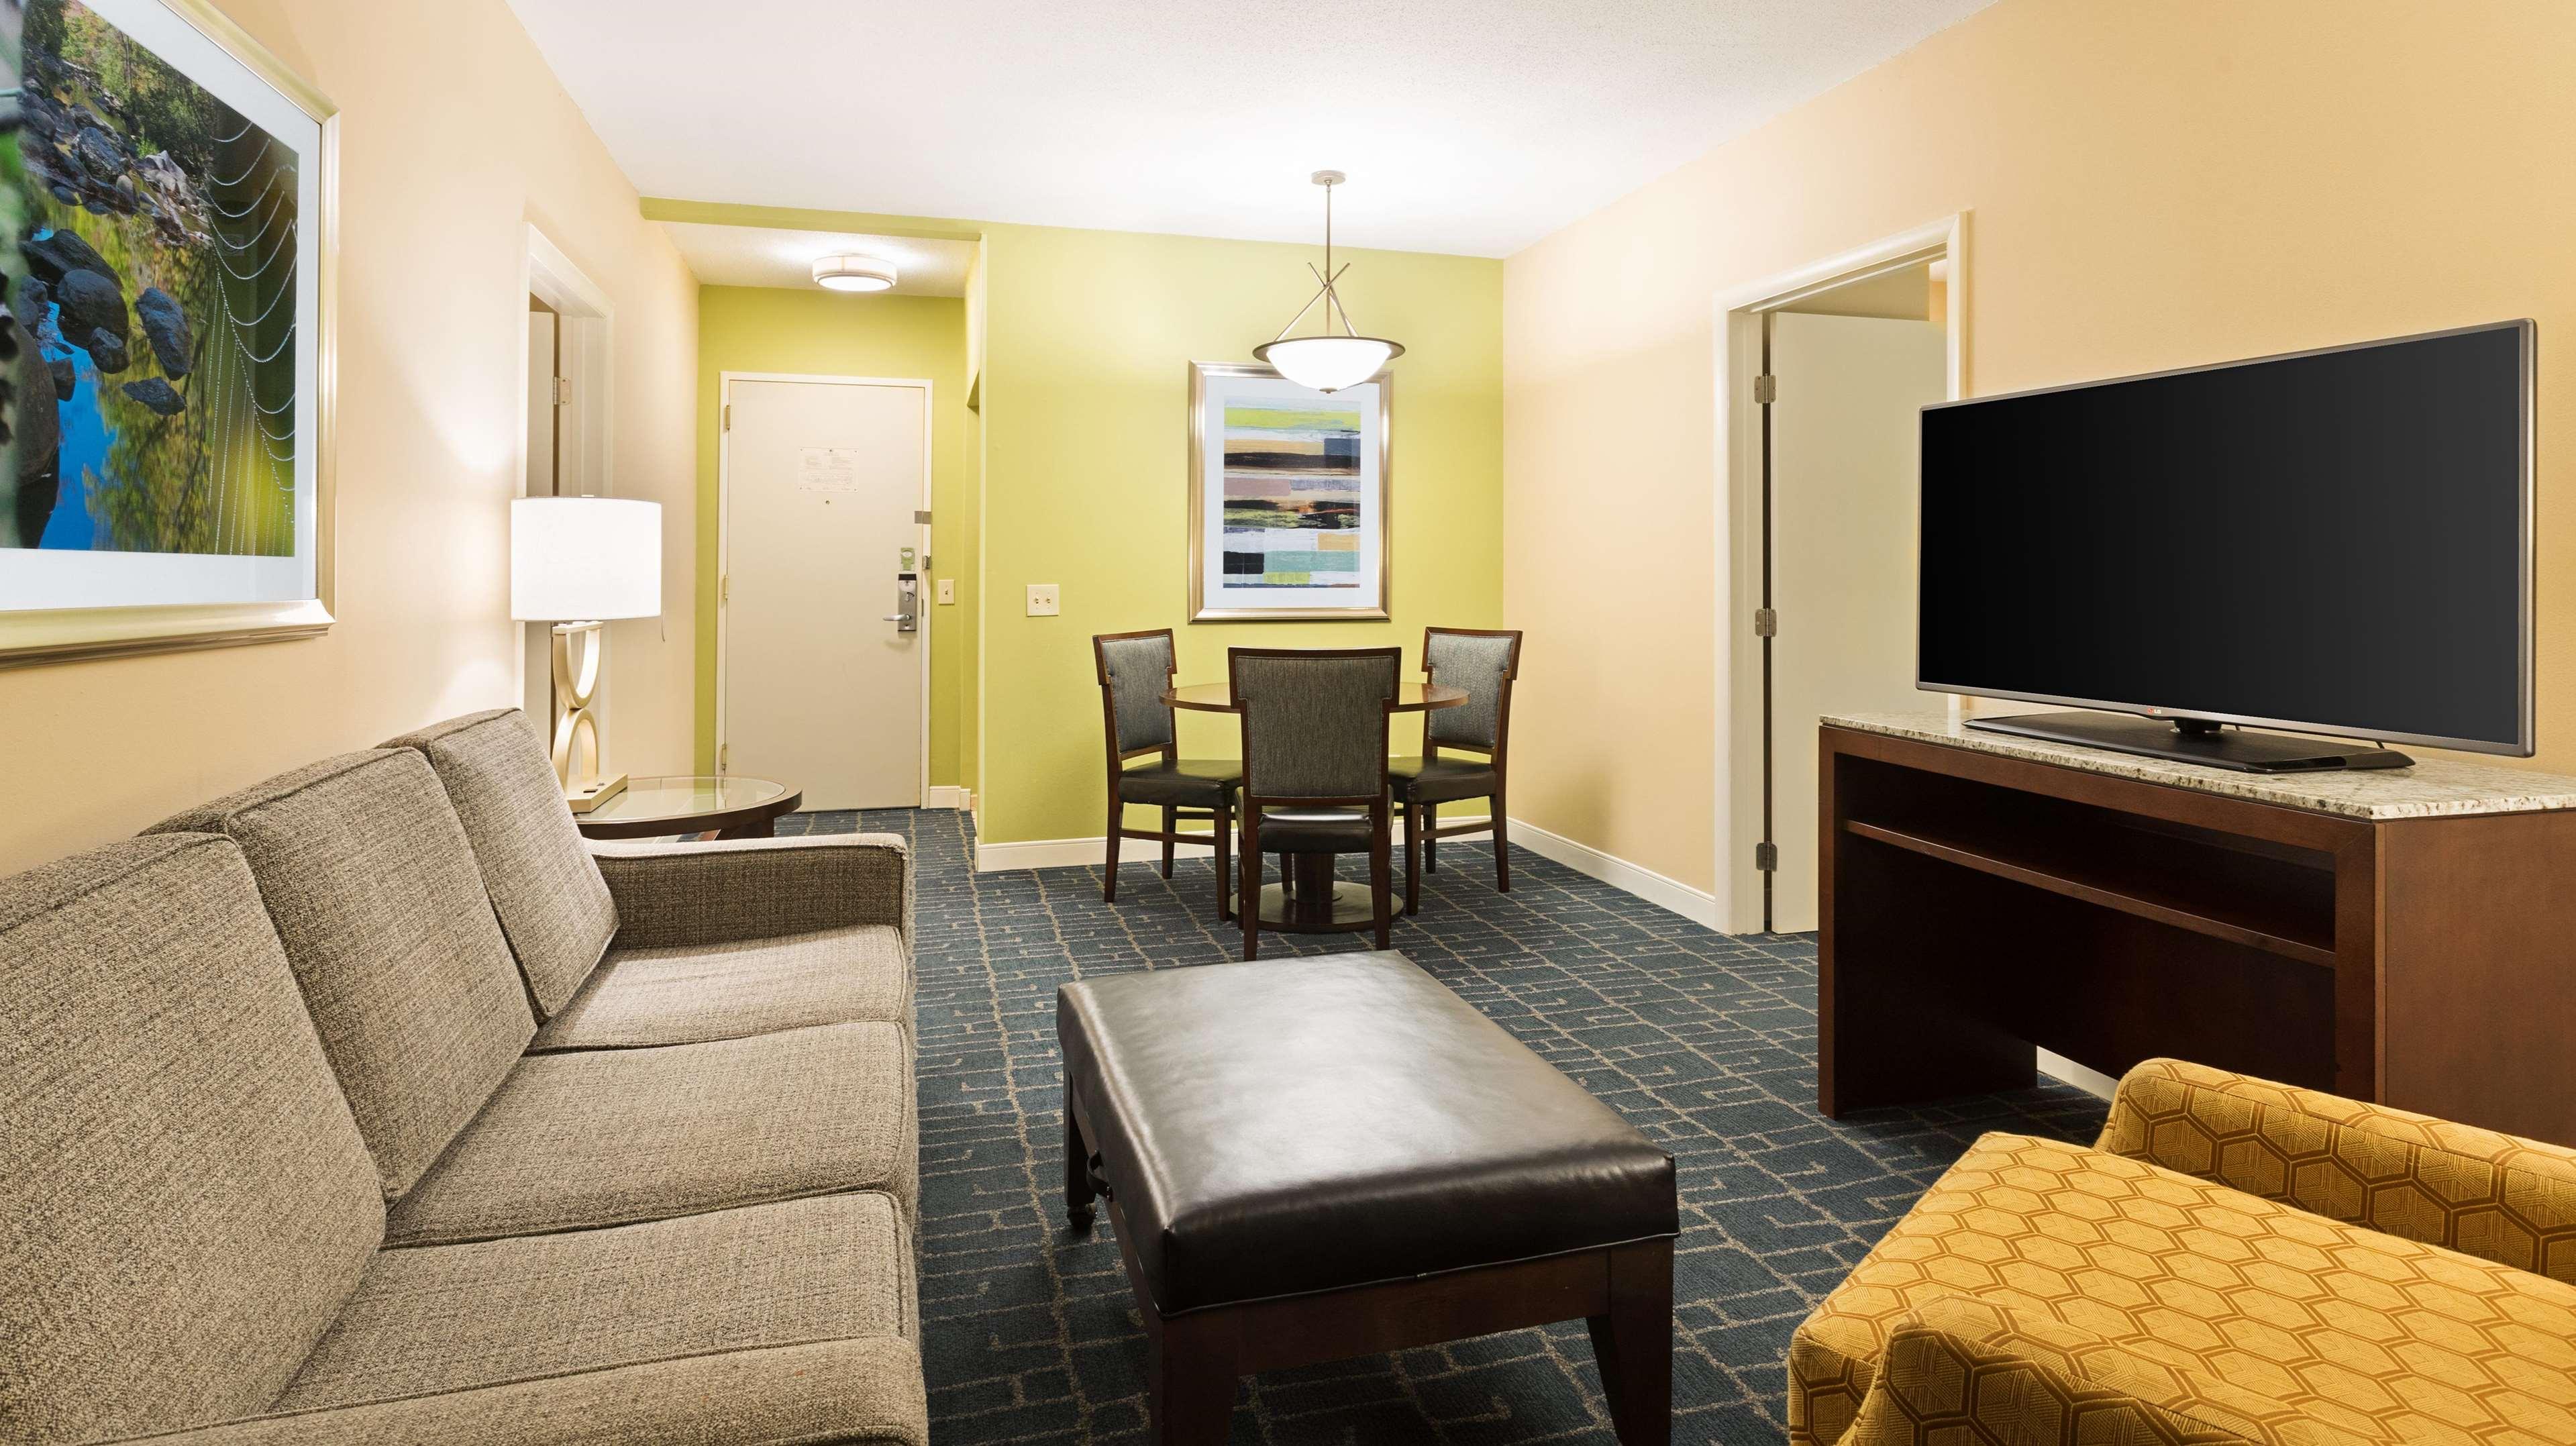 Doubletree Suites By Hilton Hotel Charlotte Southpark Charlotte North Carolina